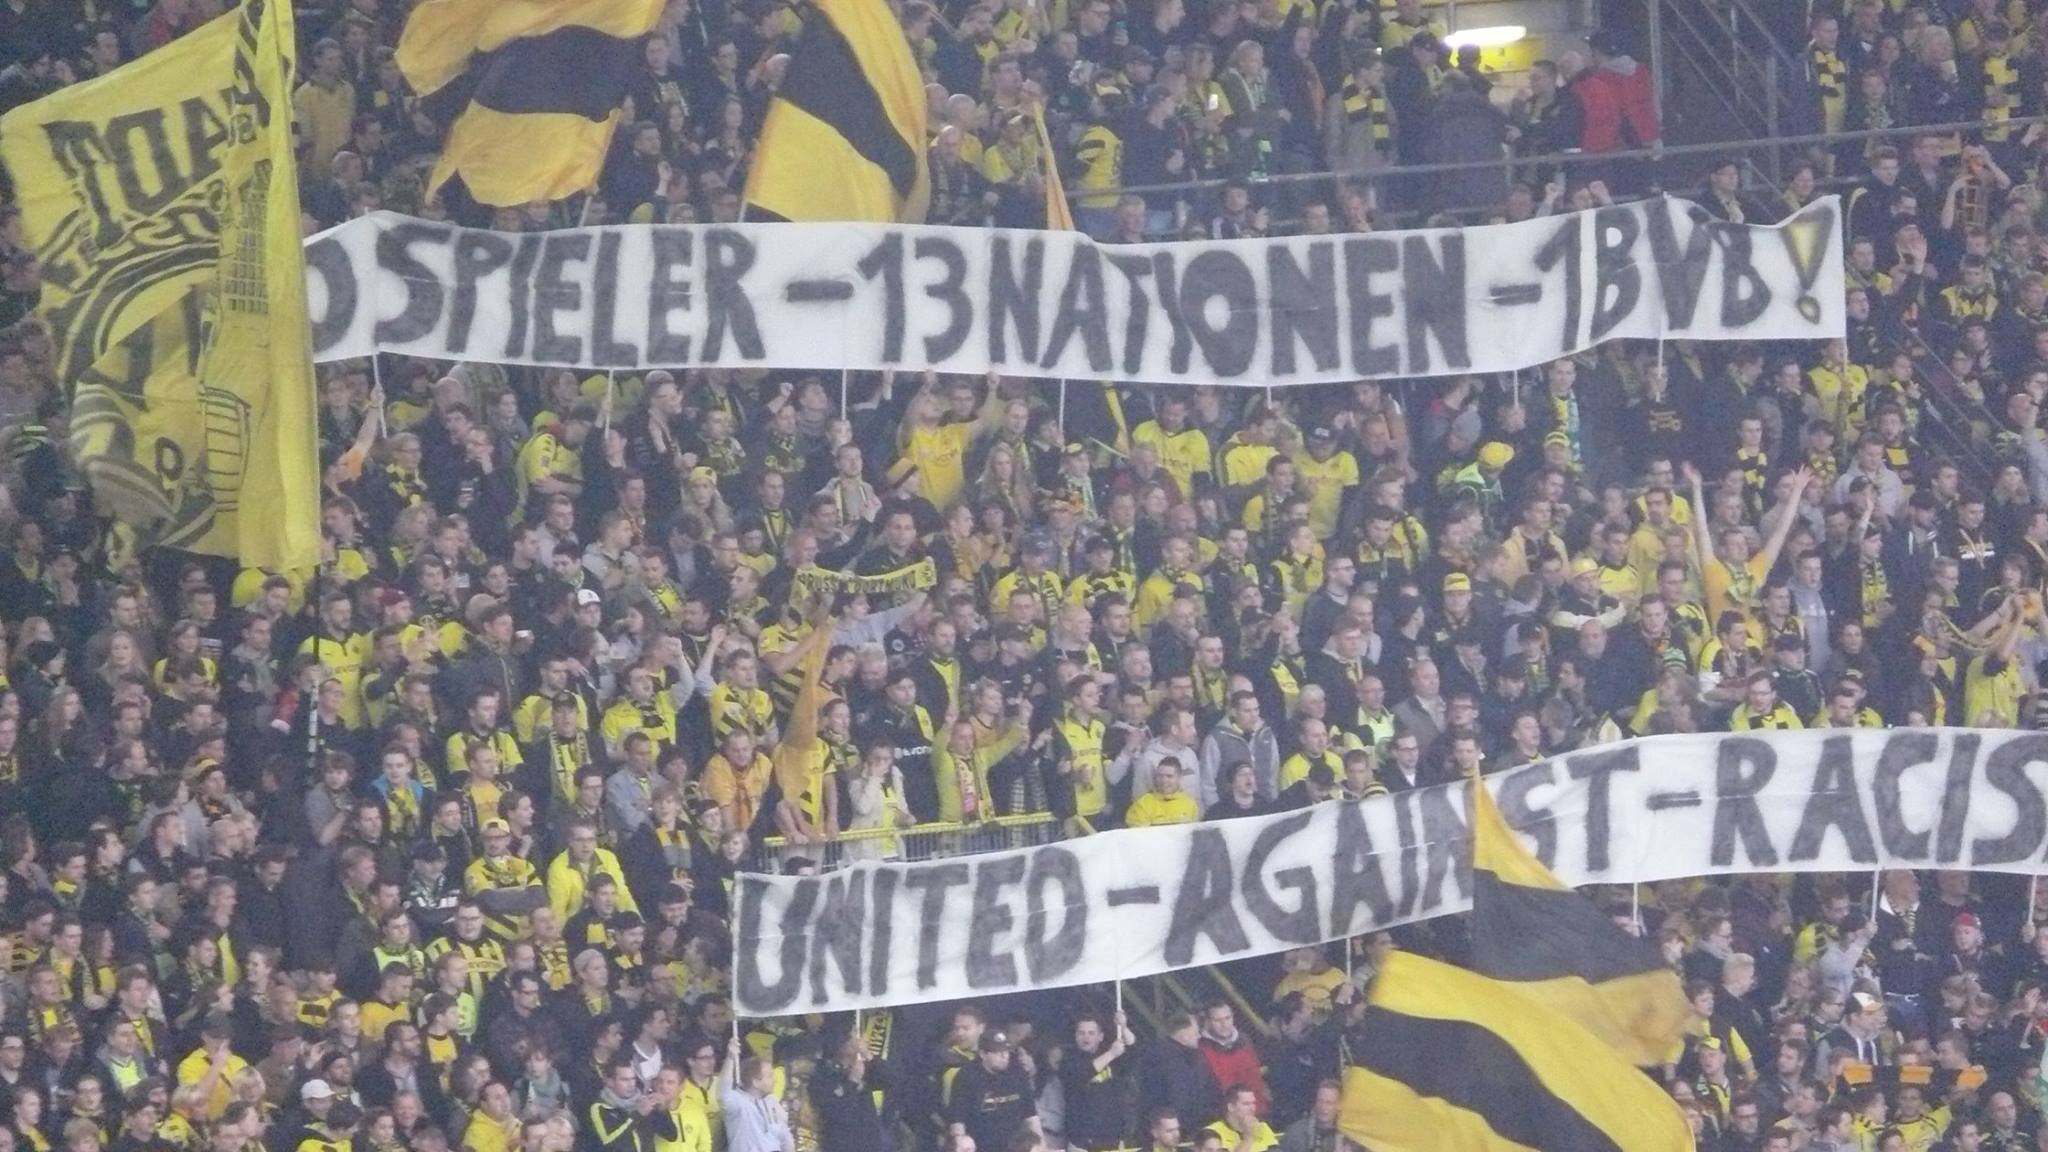 30 Spieler - 13 Nationen - 1 BVB! United against racism!